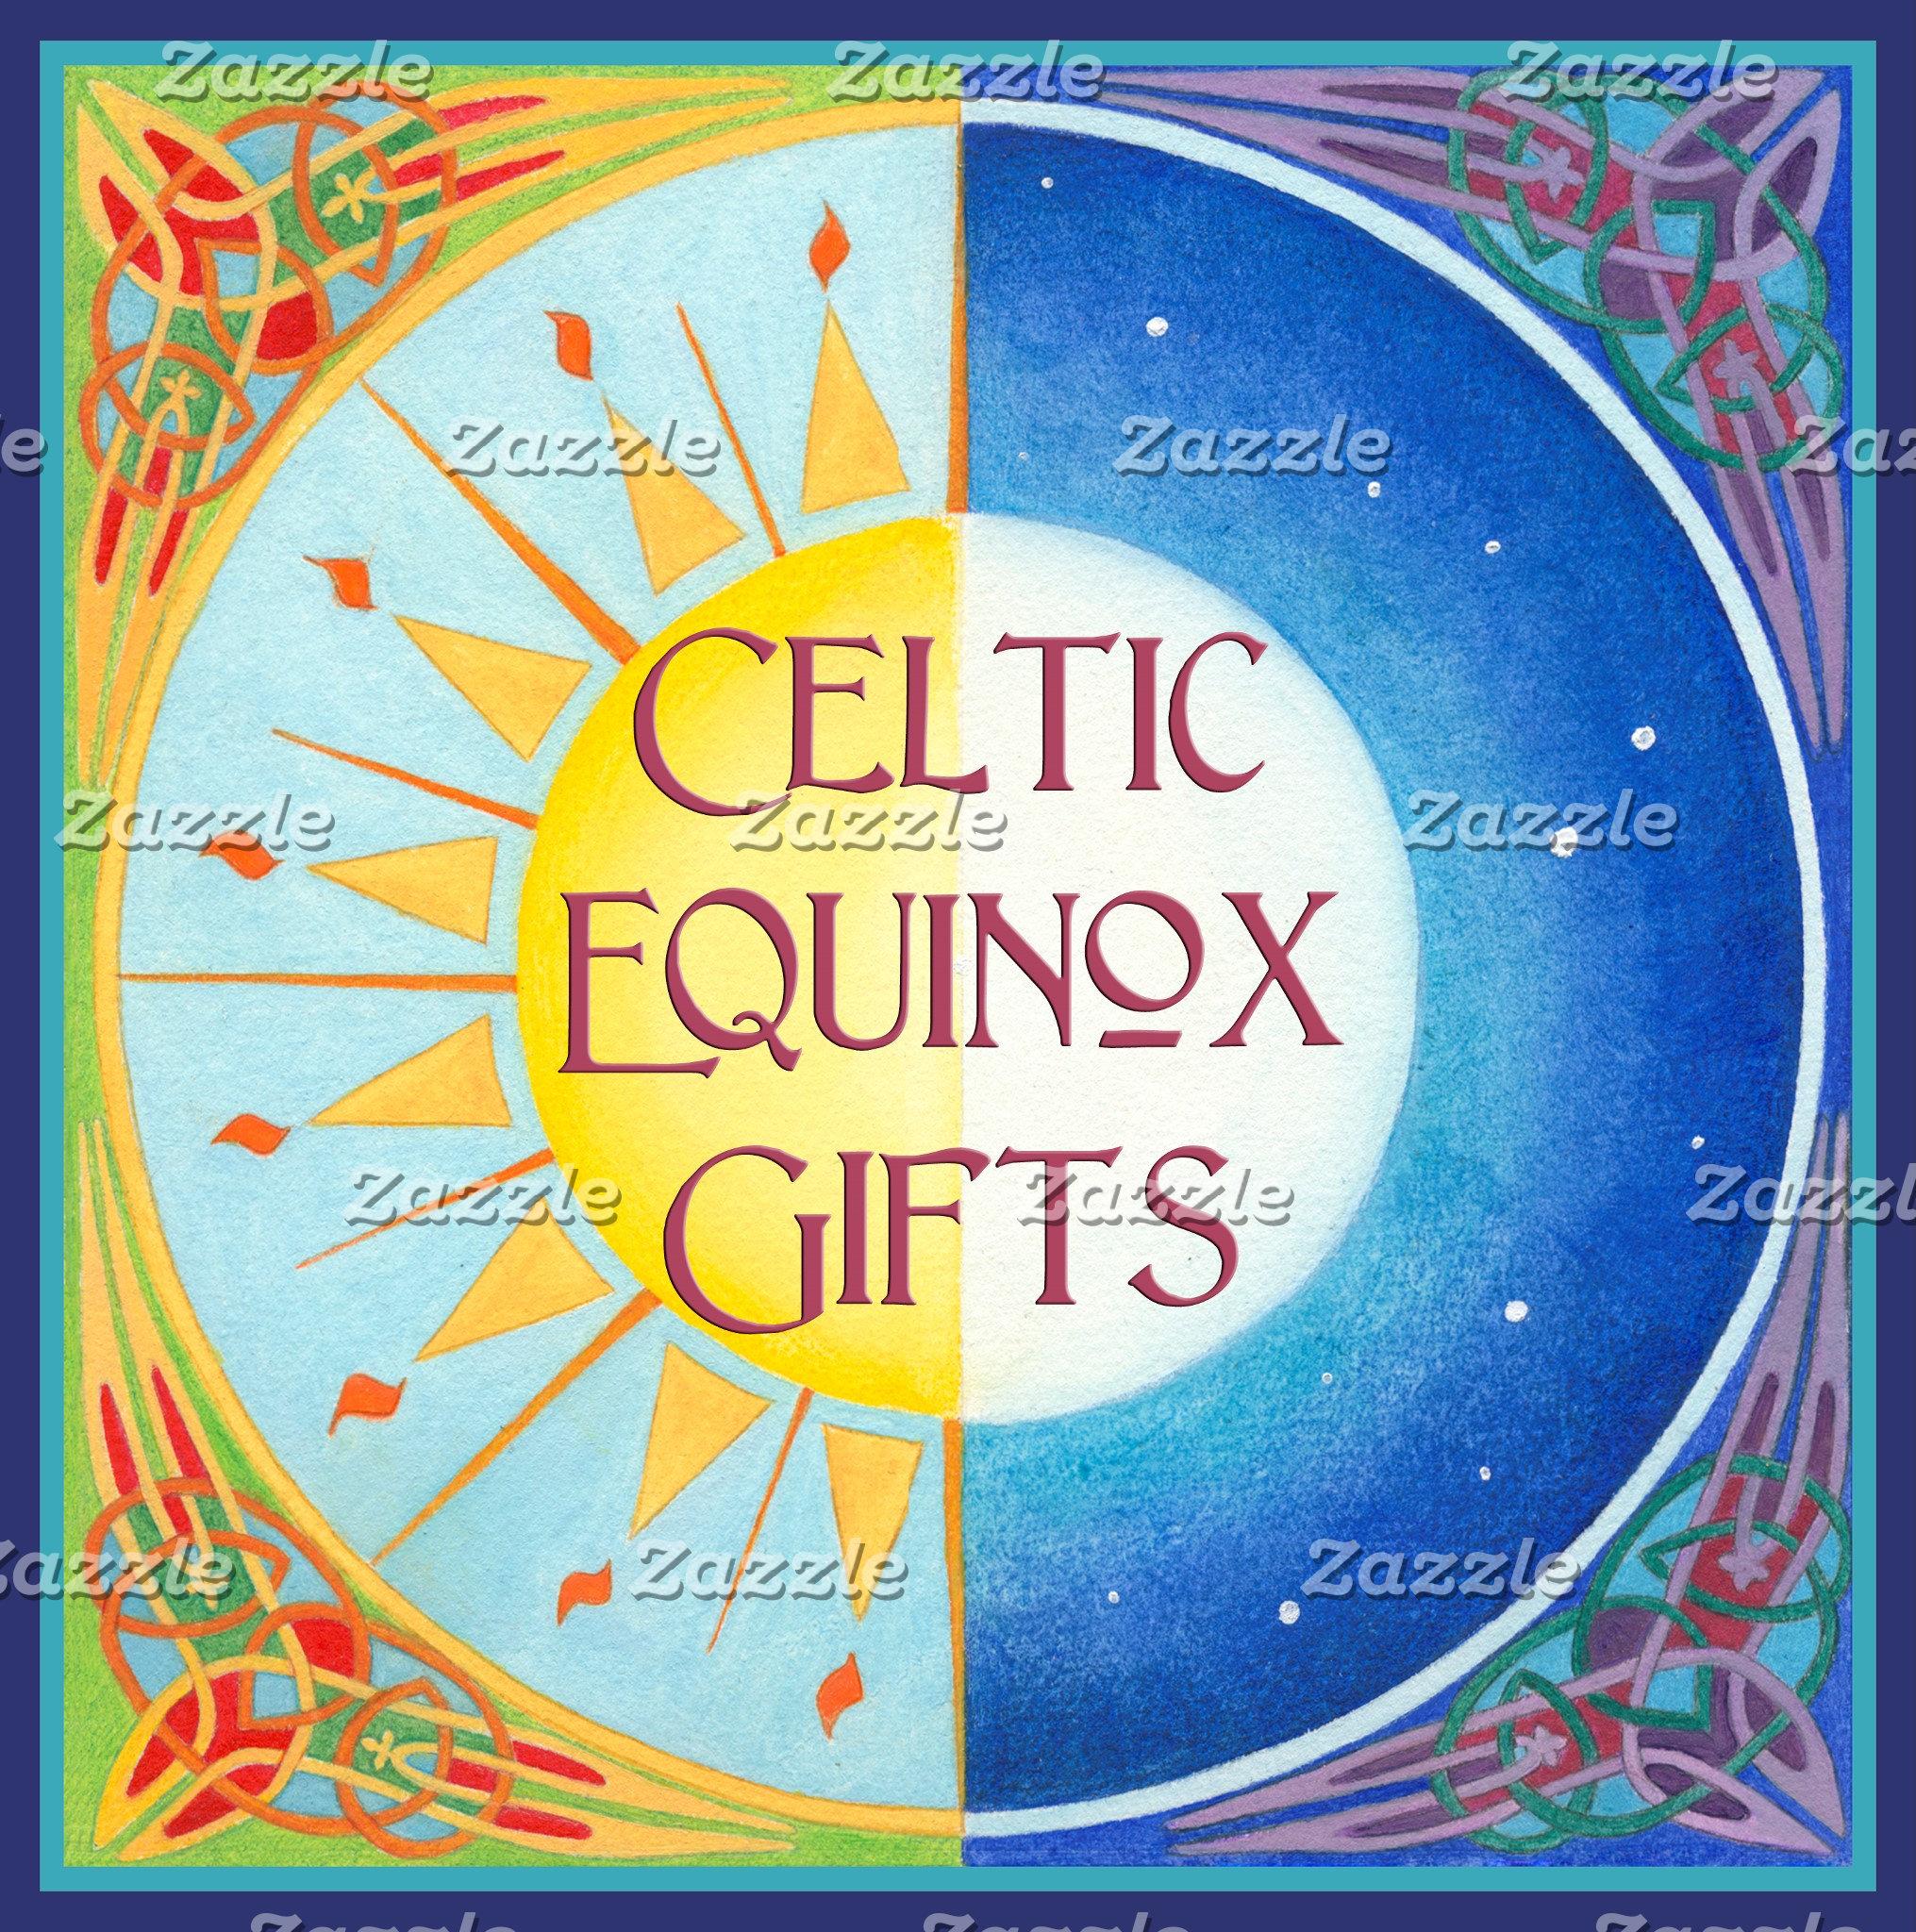 Celtic Equinox